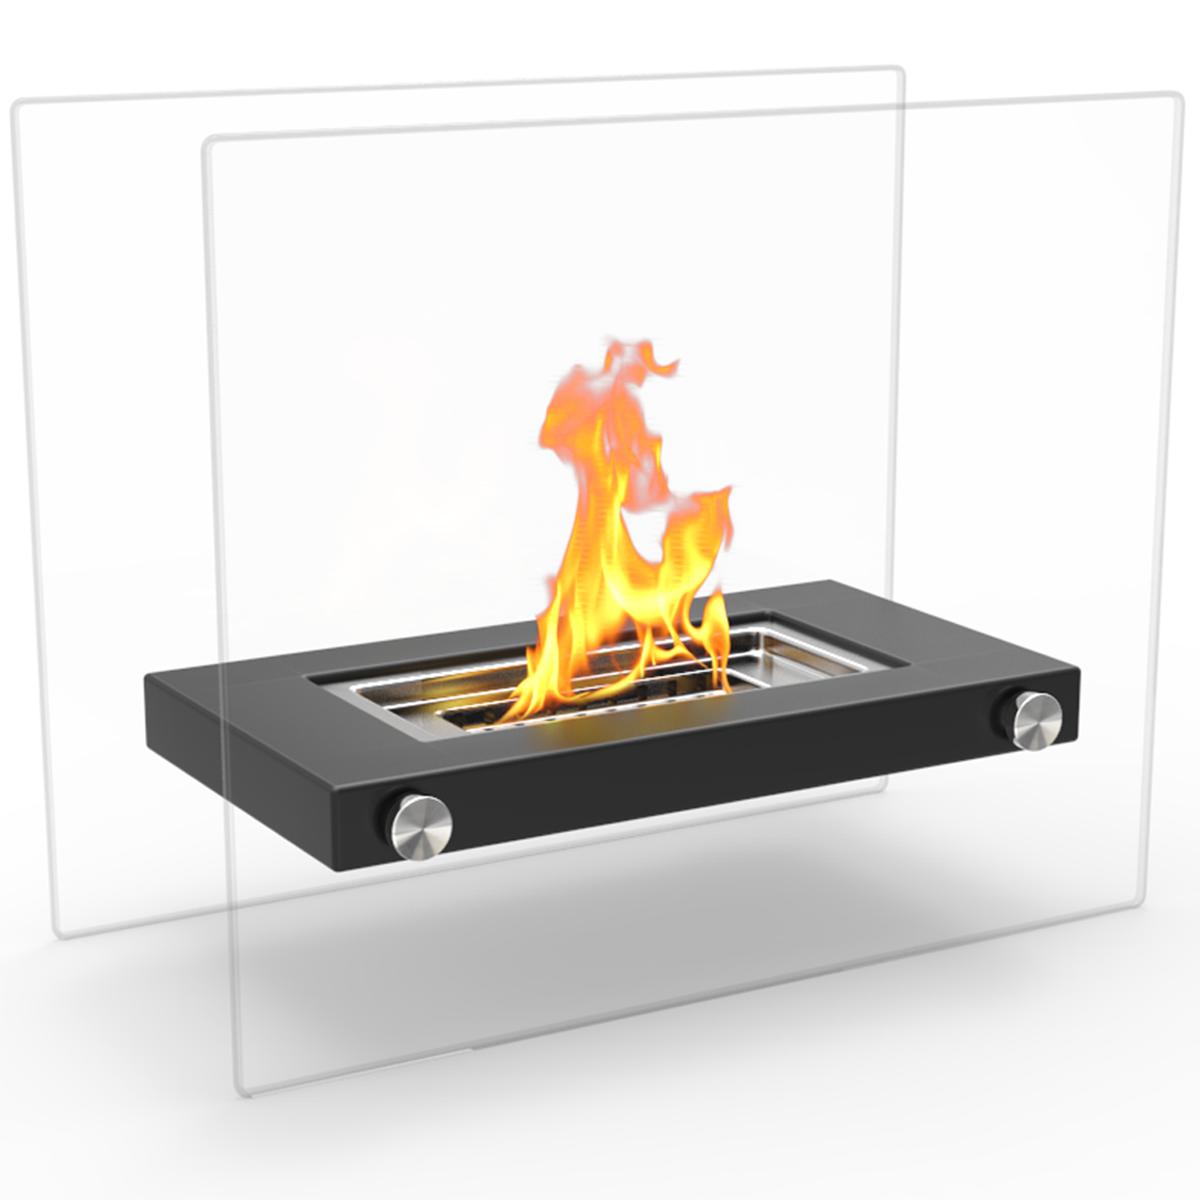 Regal Flame Monrow Ventless Tabletop Portable Bio Ethanol Fireplace In Black